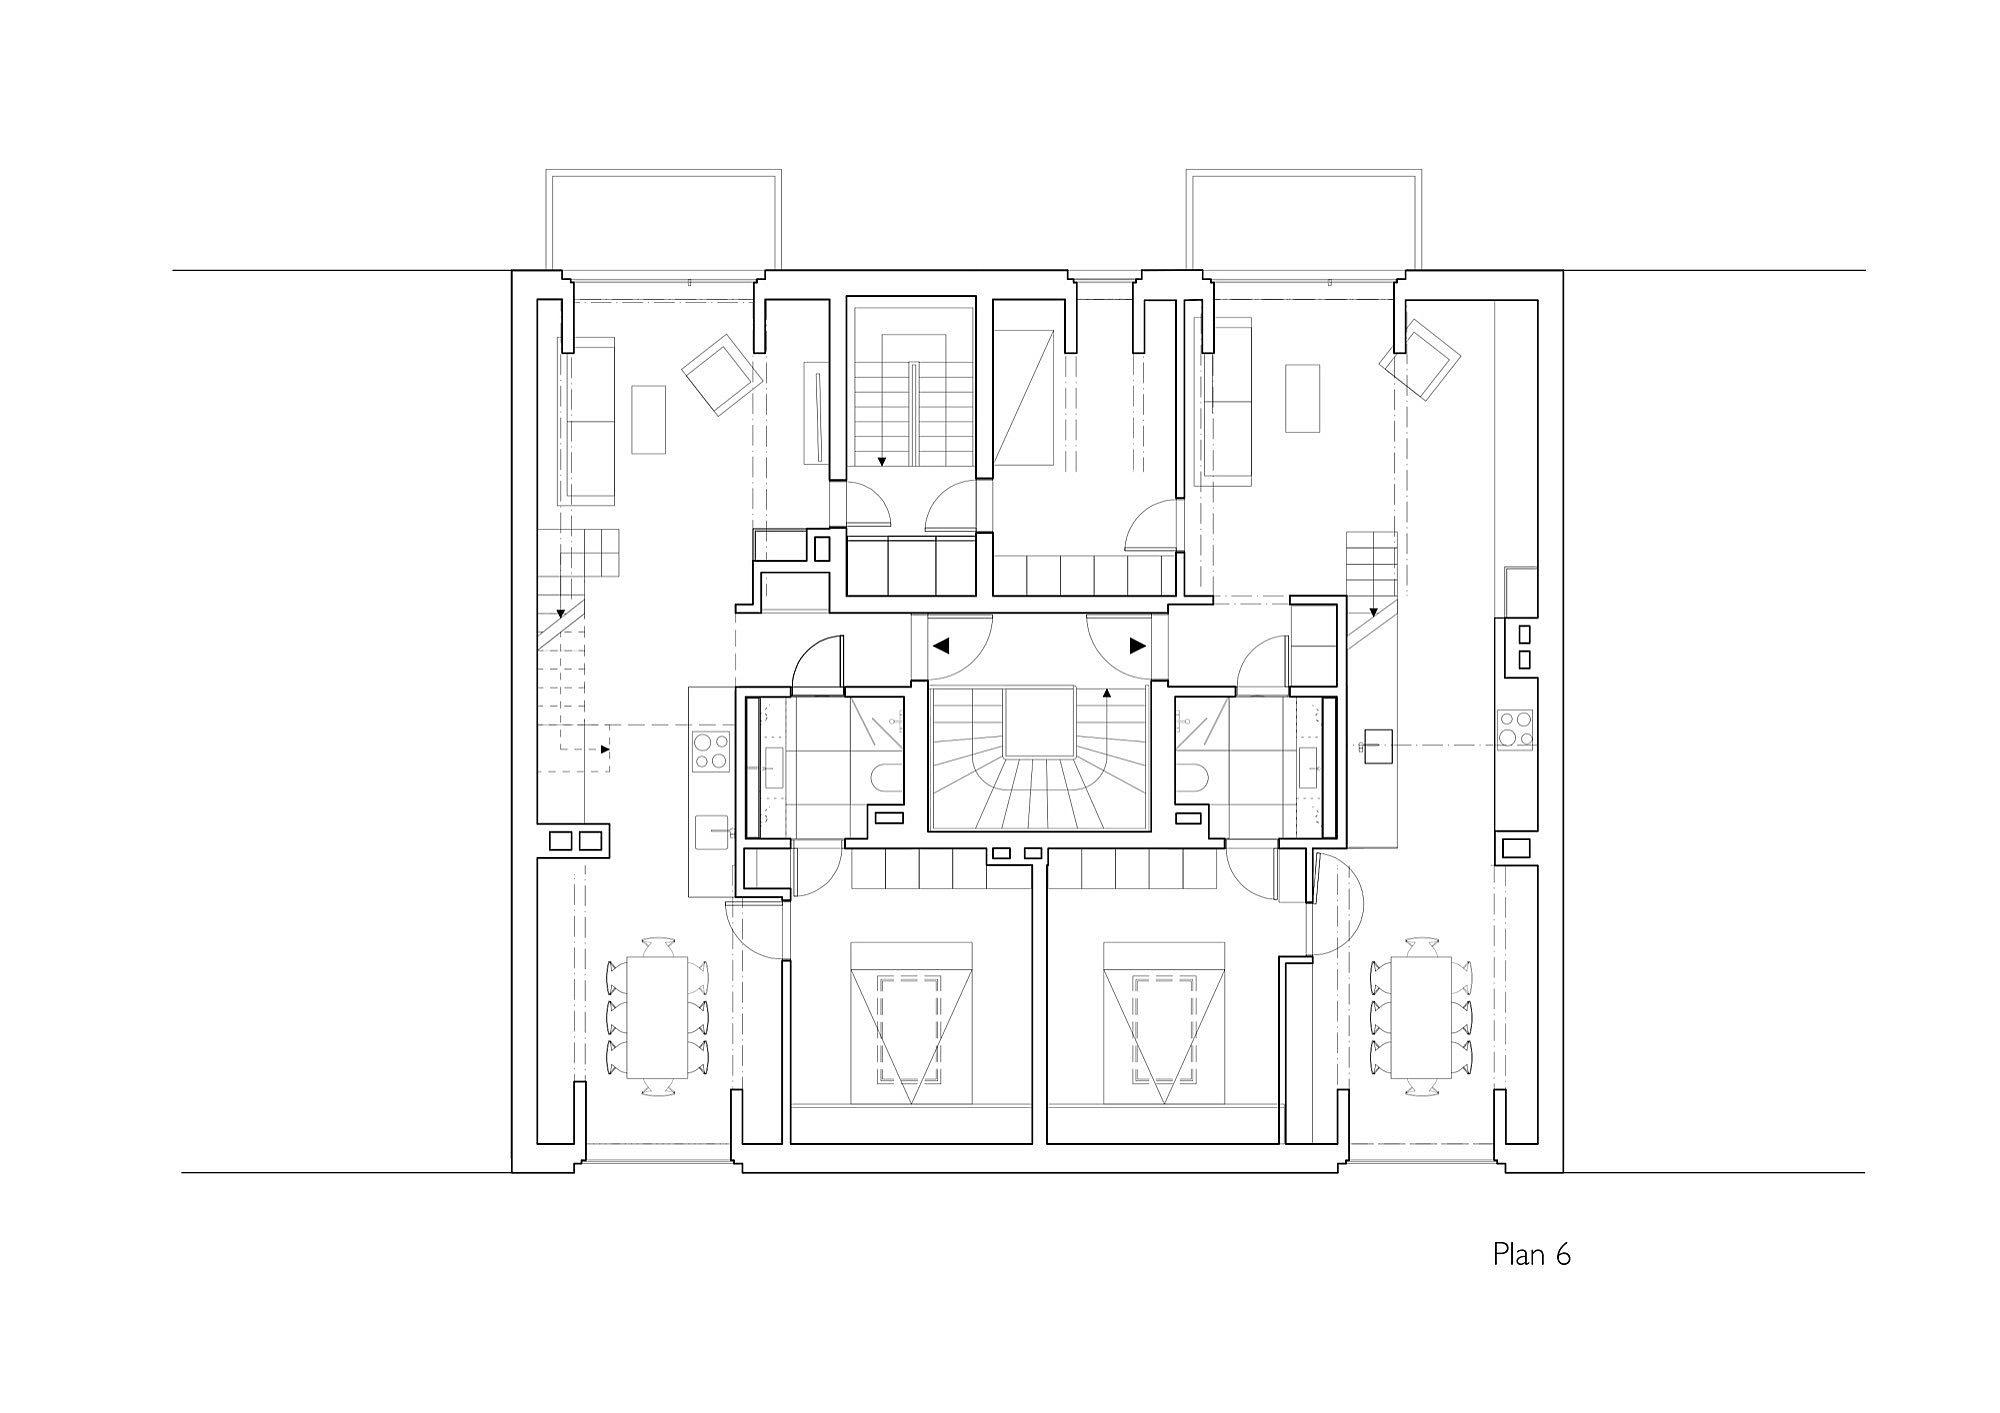 Lower level floor plan of Vidars Gate designed by R21 Arkitekter